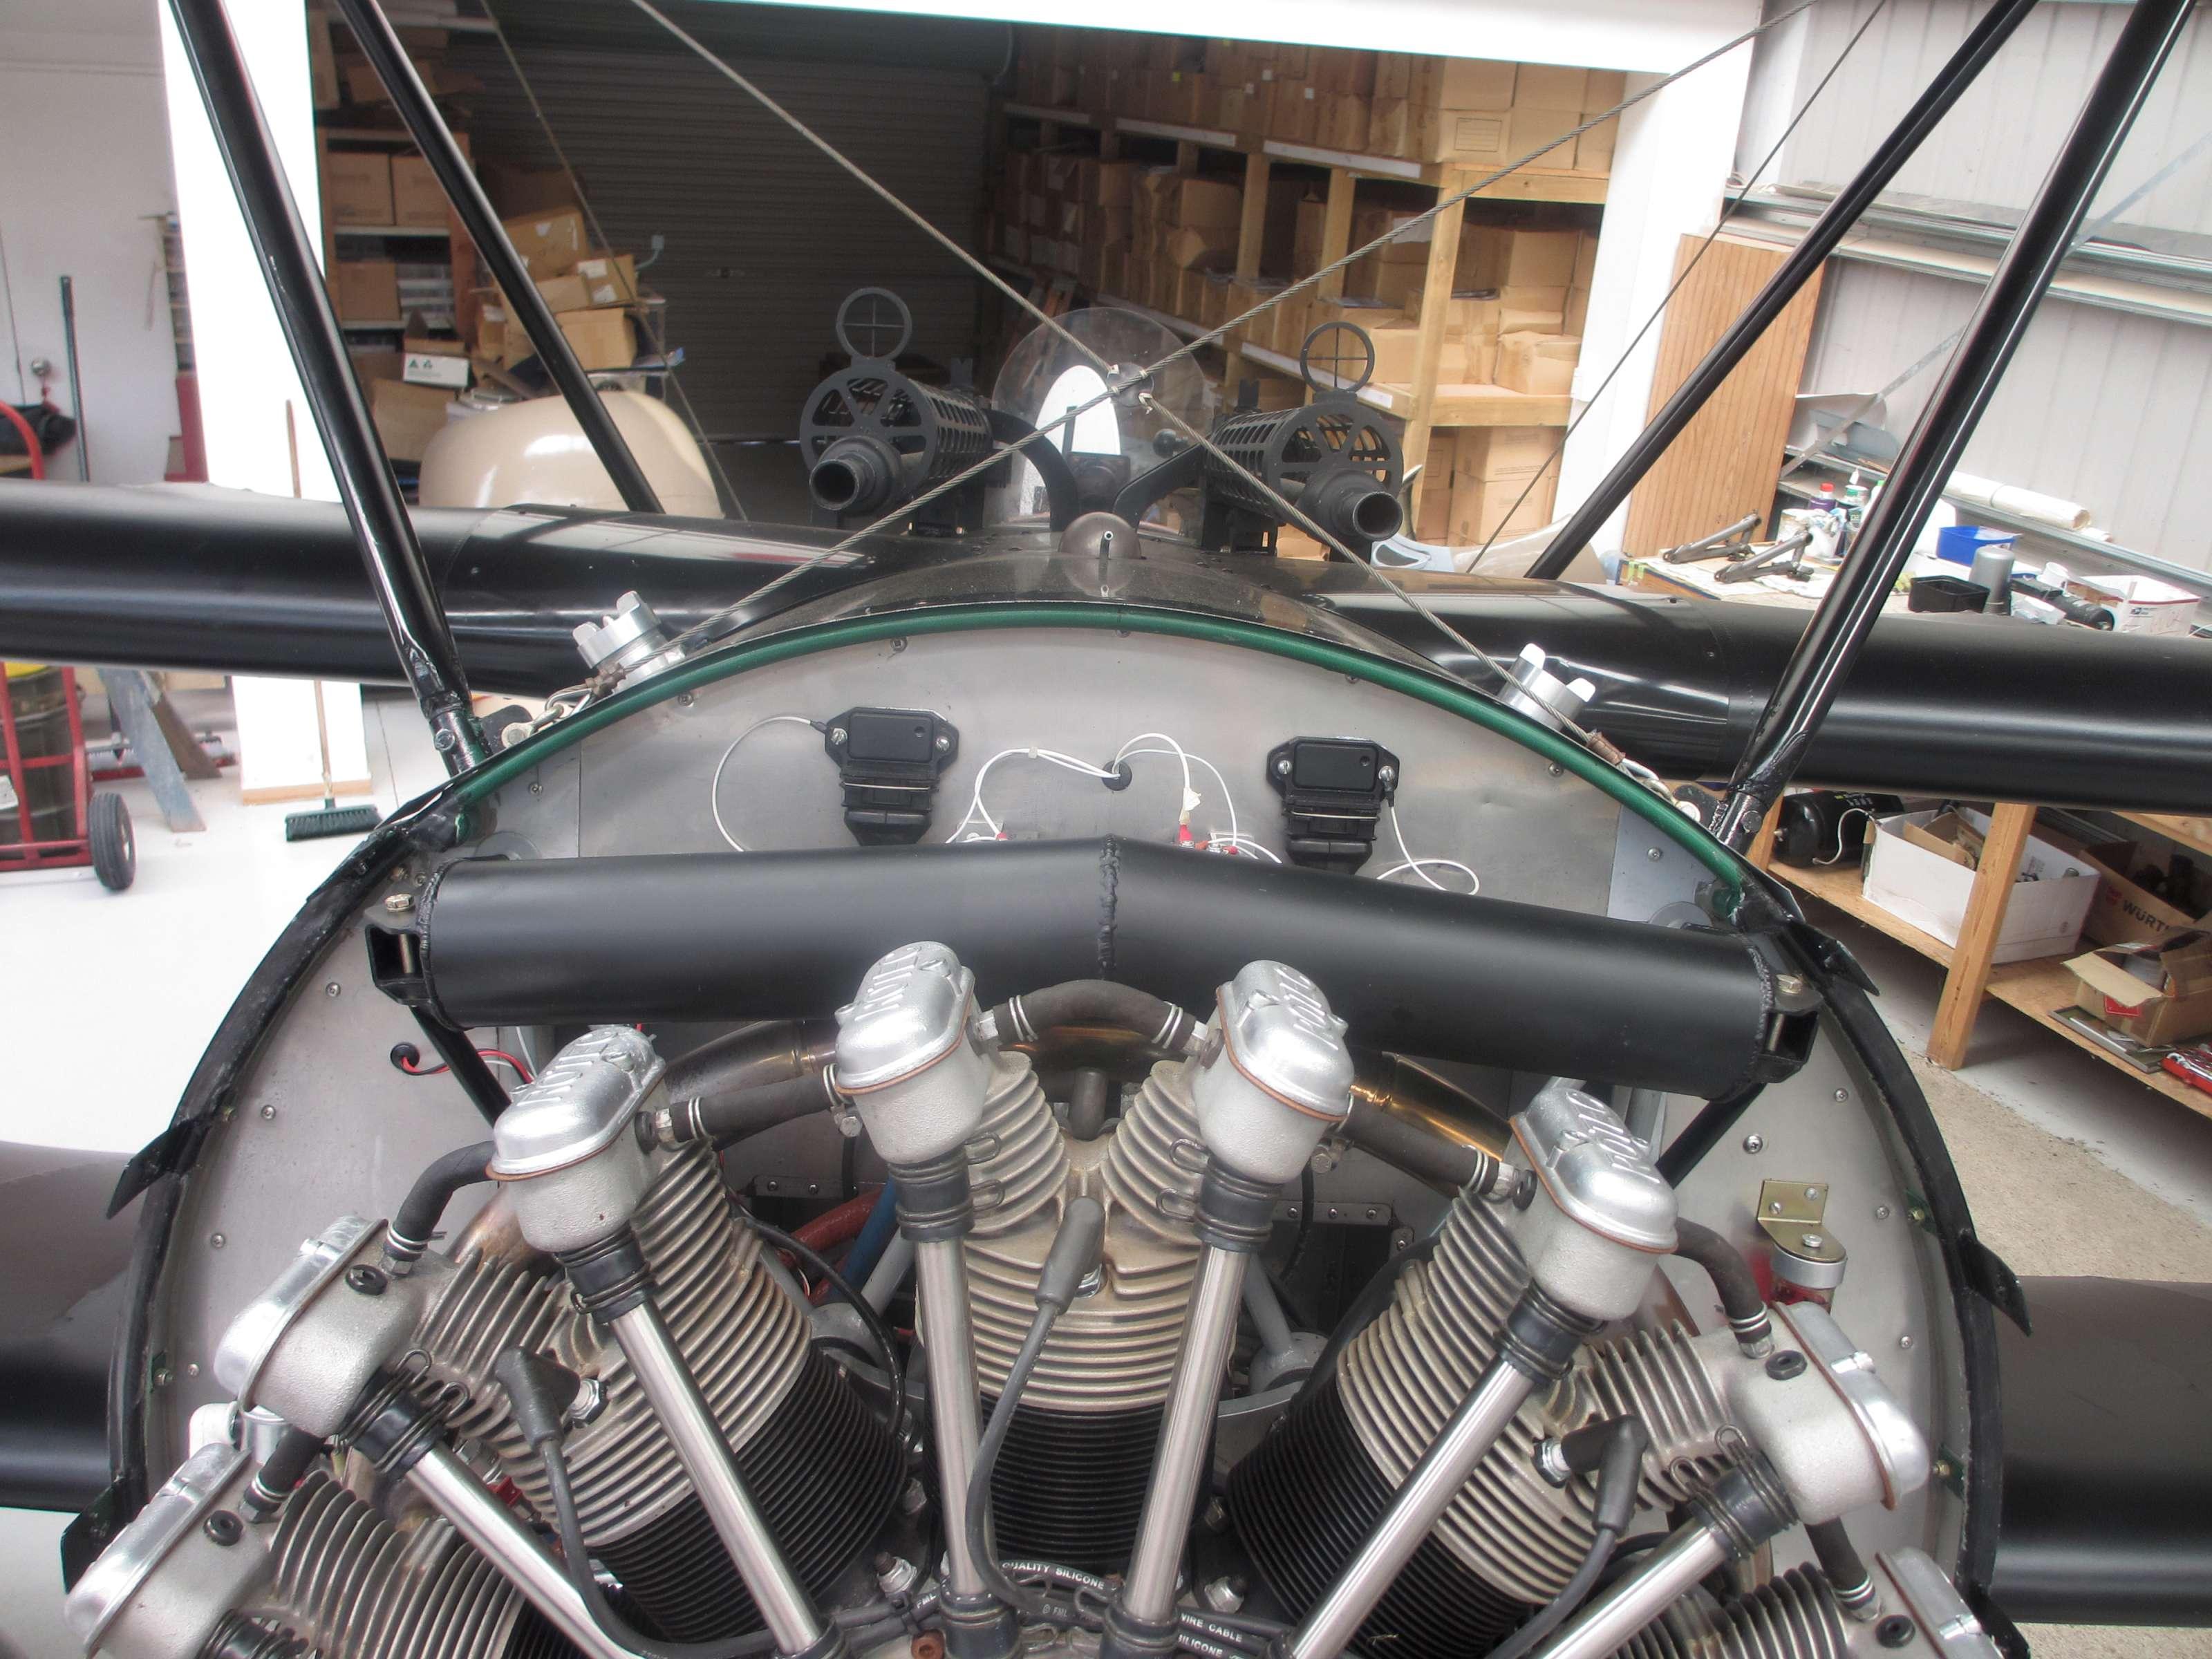 Engine Mount & Oil Tank designs | Dan Cabral - Product